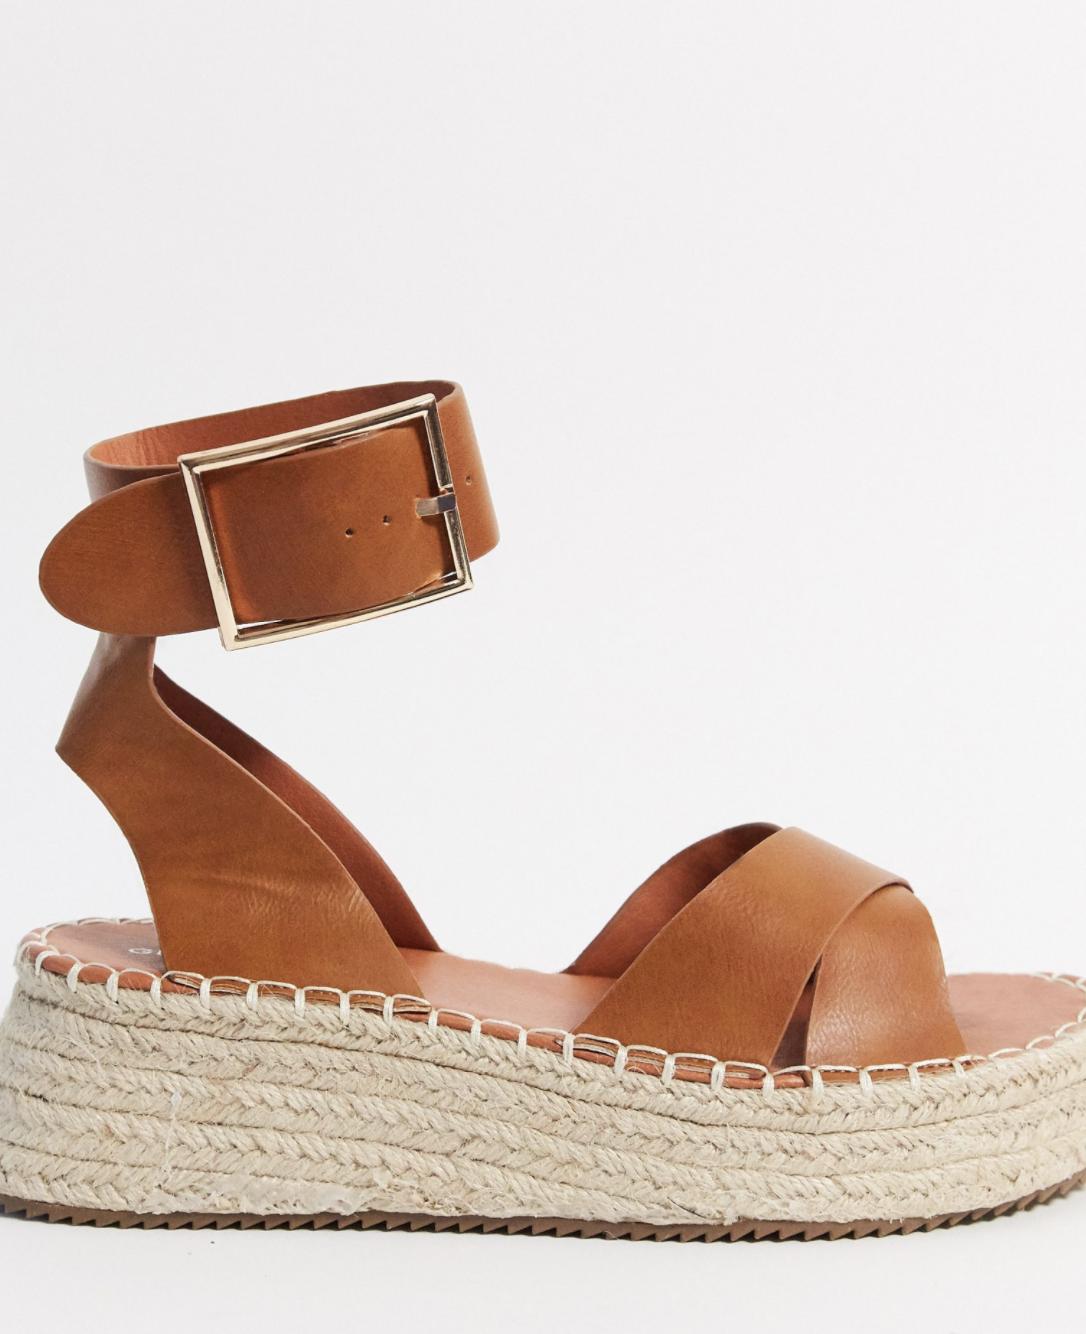 Sandalias de plataforma con diseño estilo alpargata en color tostado de Glamorous